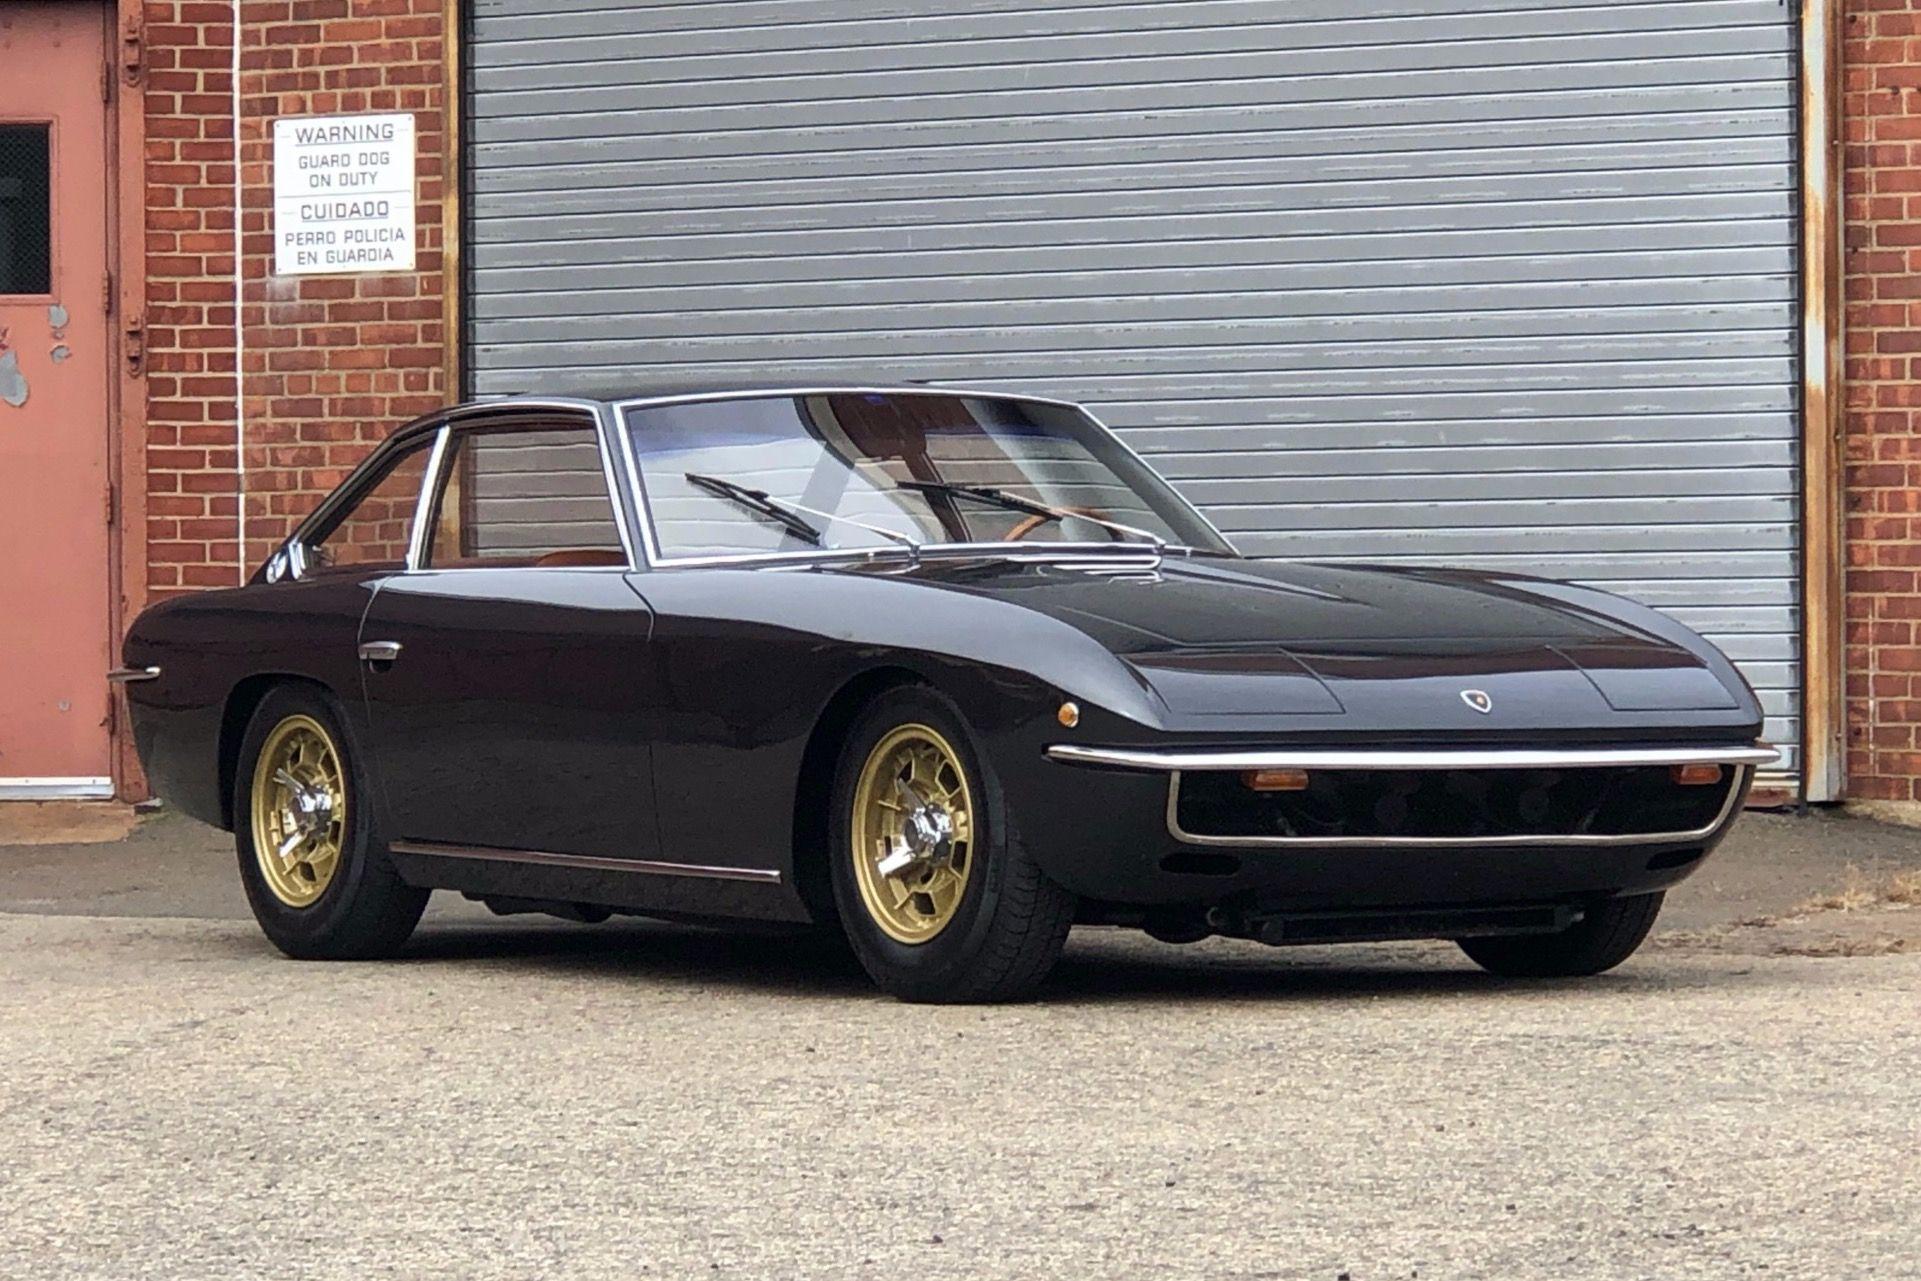 "<img src=""1969-lamborghini-islero.jpg"" alt=""This stunning 1969 Lamborghini Islero is up for bids through Bring A Trailer"">"